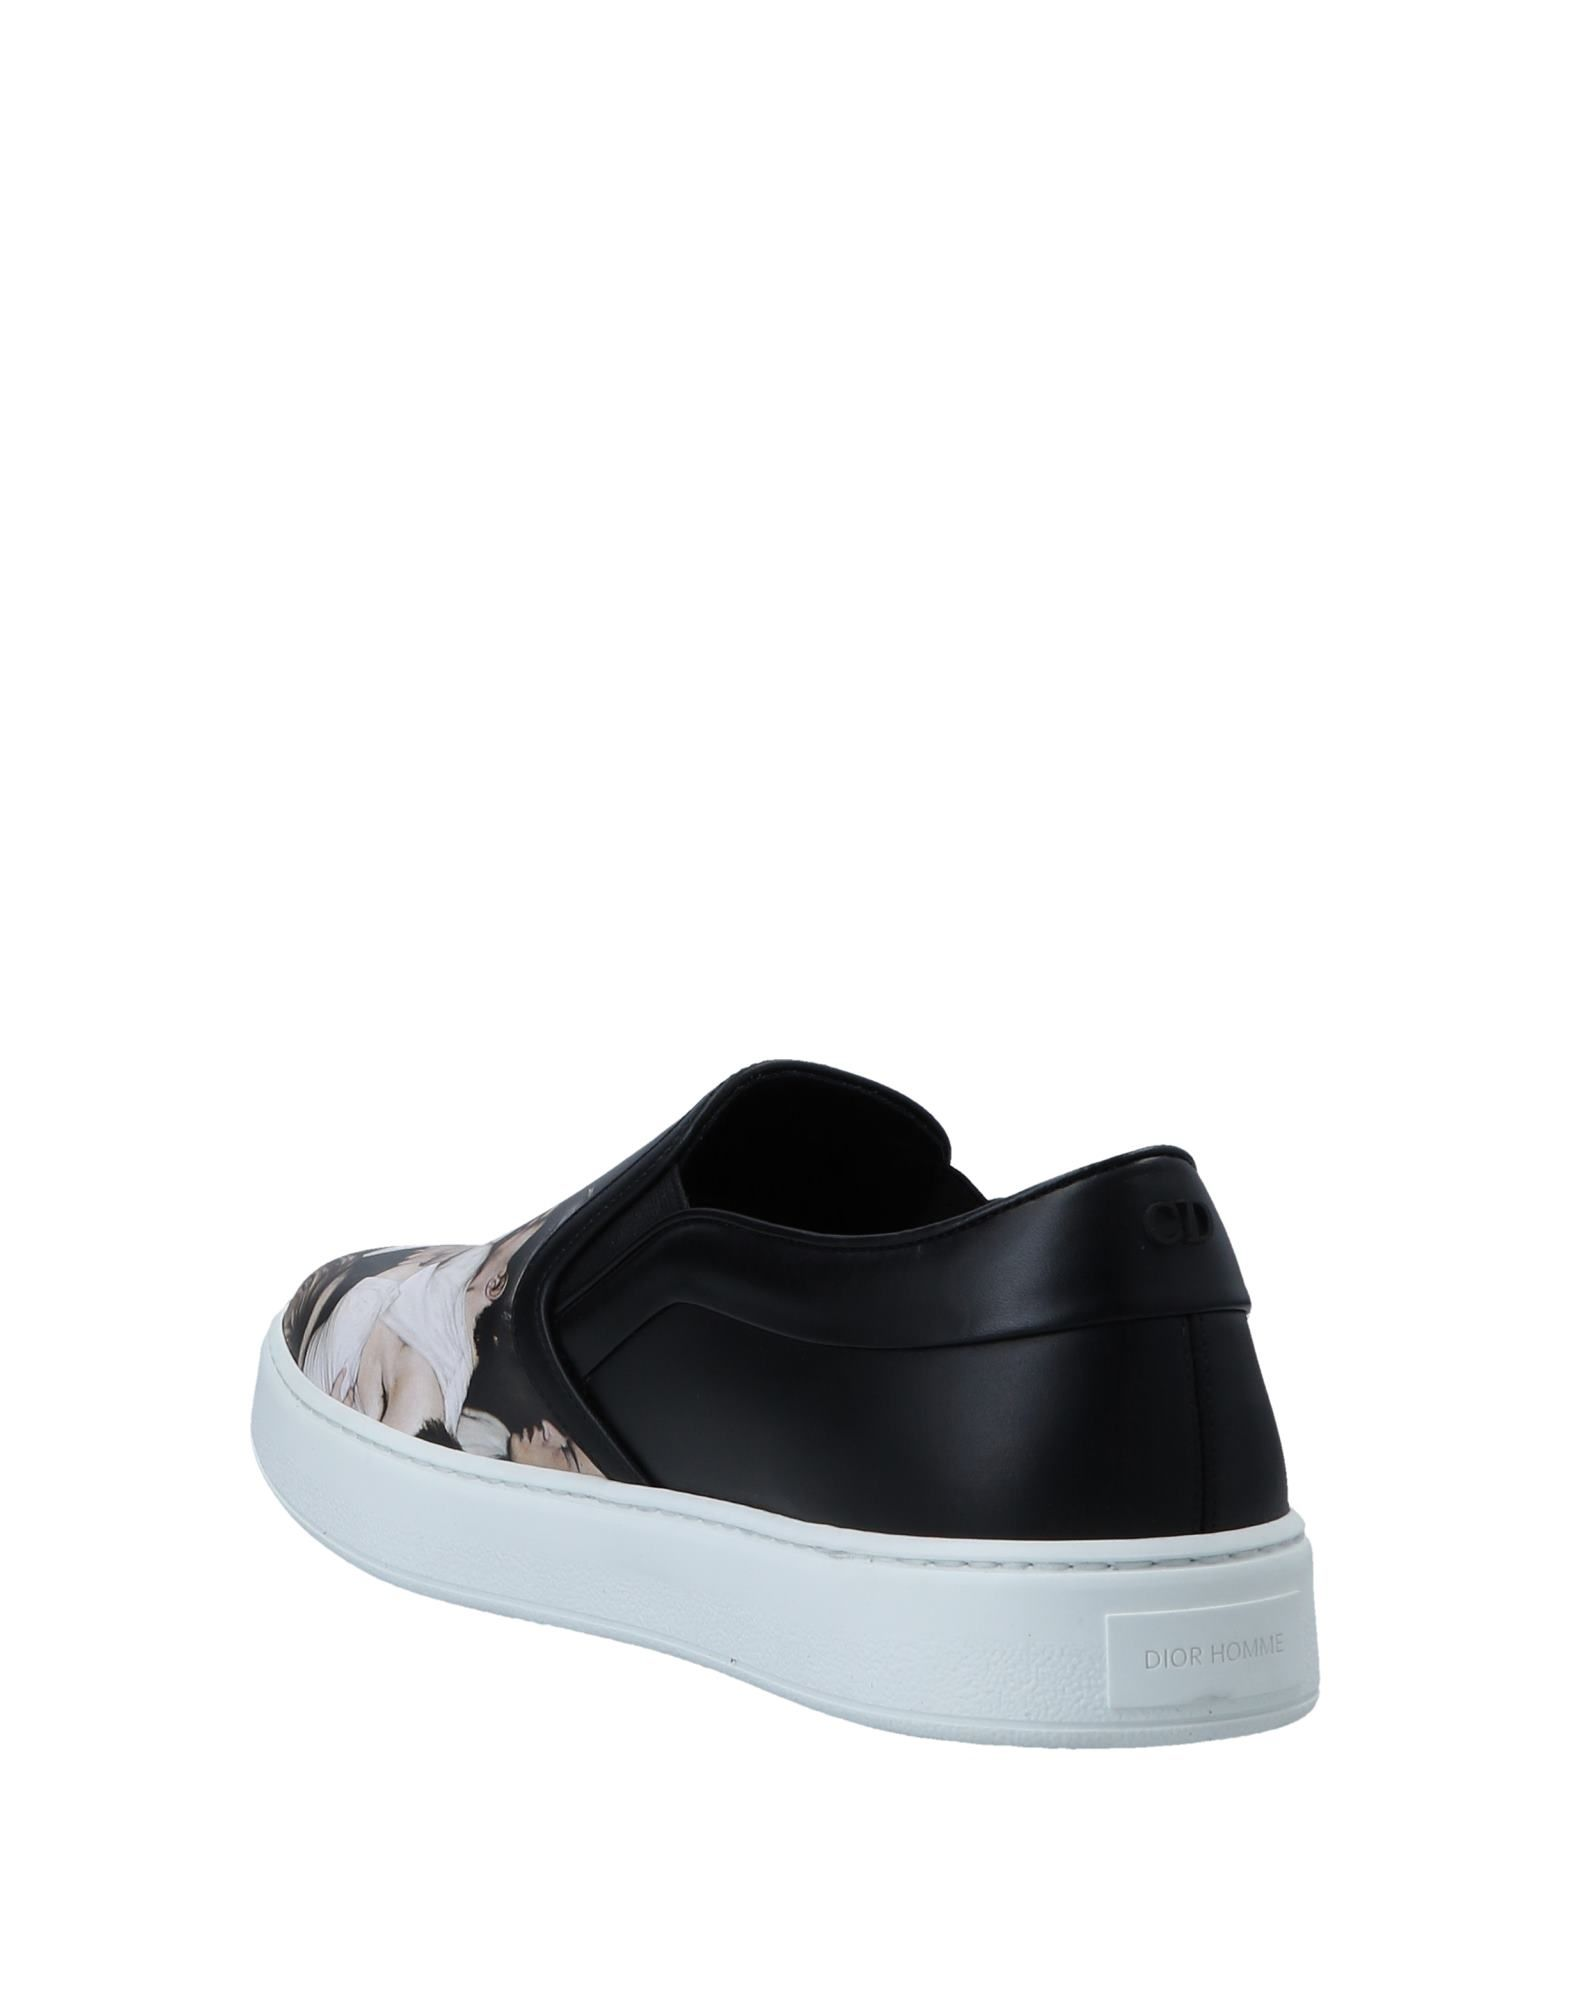 Dior Homme Gute Sneakers Herren  11555459RS Gute Homme Qualität beliebte Schuhe f0d8cb